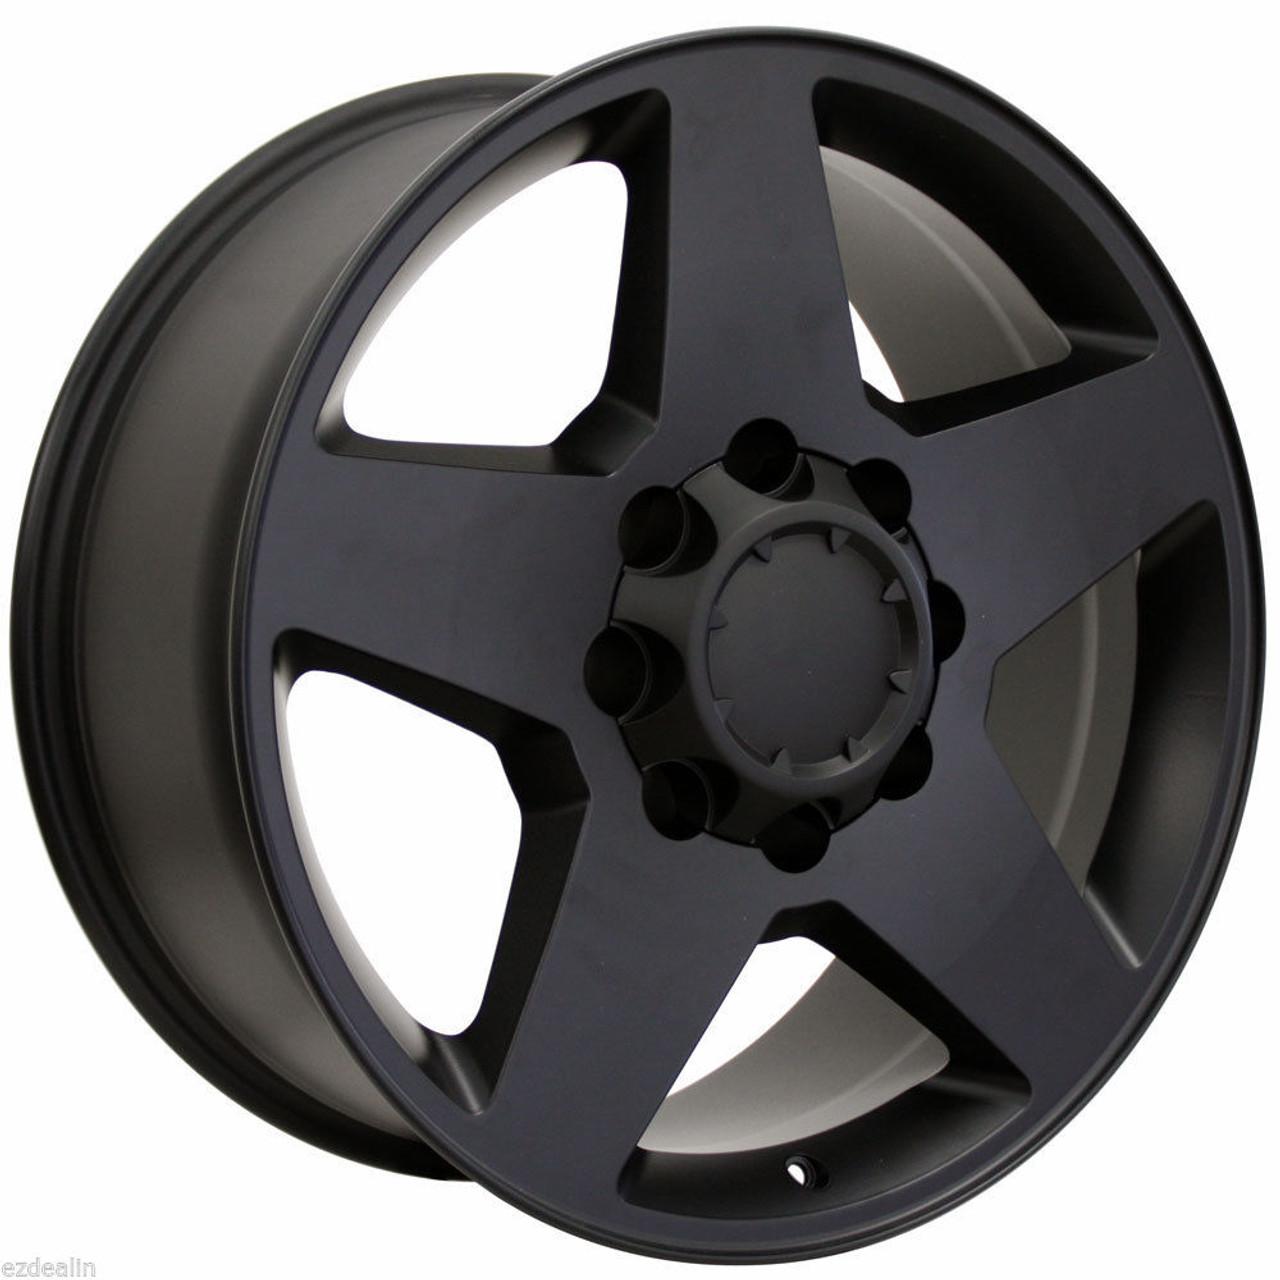 "Satin Matte Black 20"" 8 Lug 8-165 Wheels for 2001-2010 GMC 2500 3500 - New Set of 4"